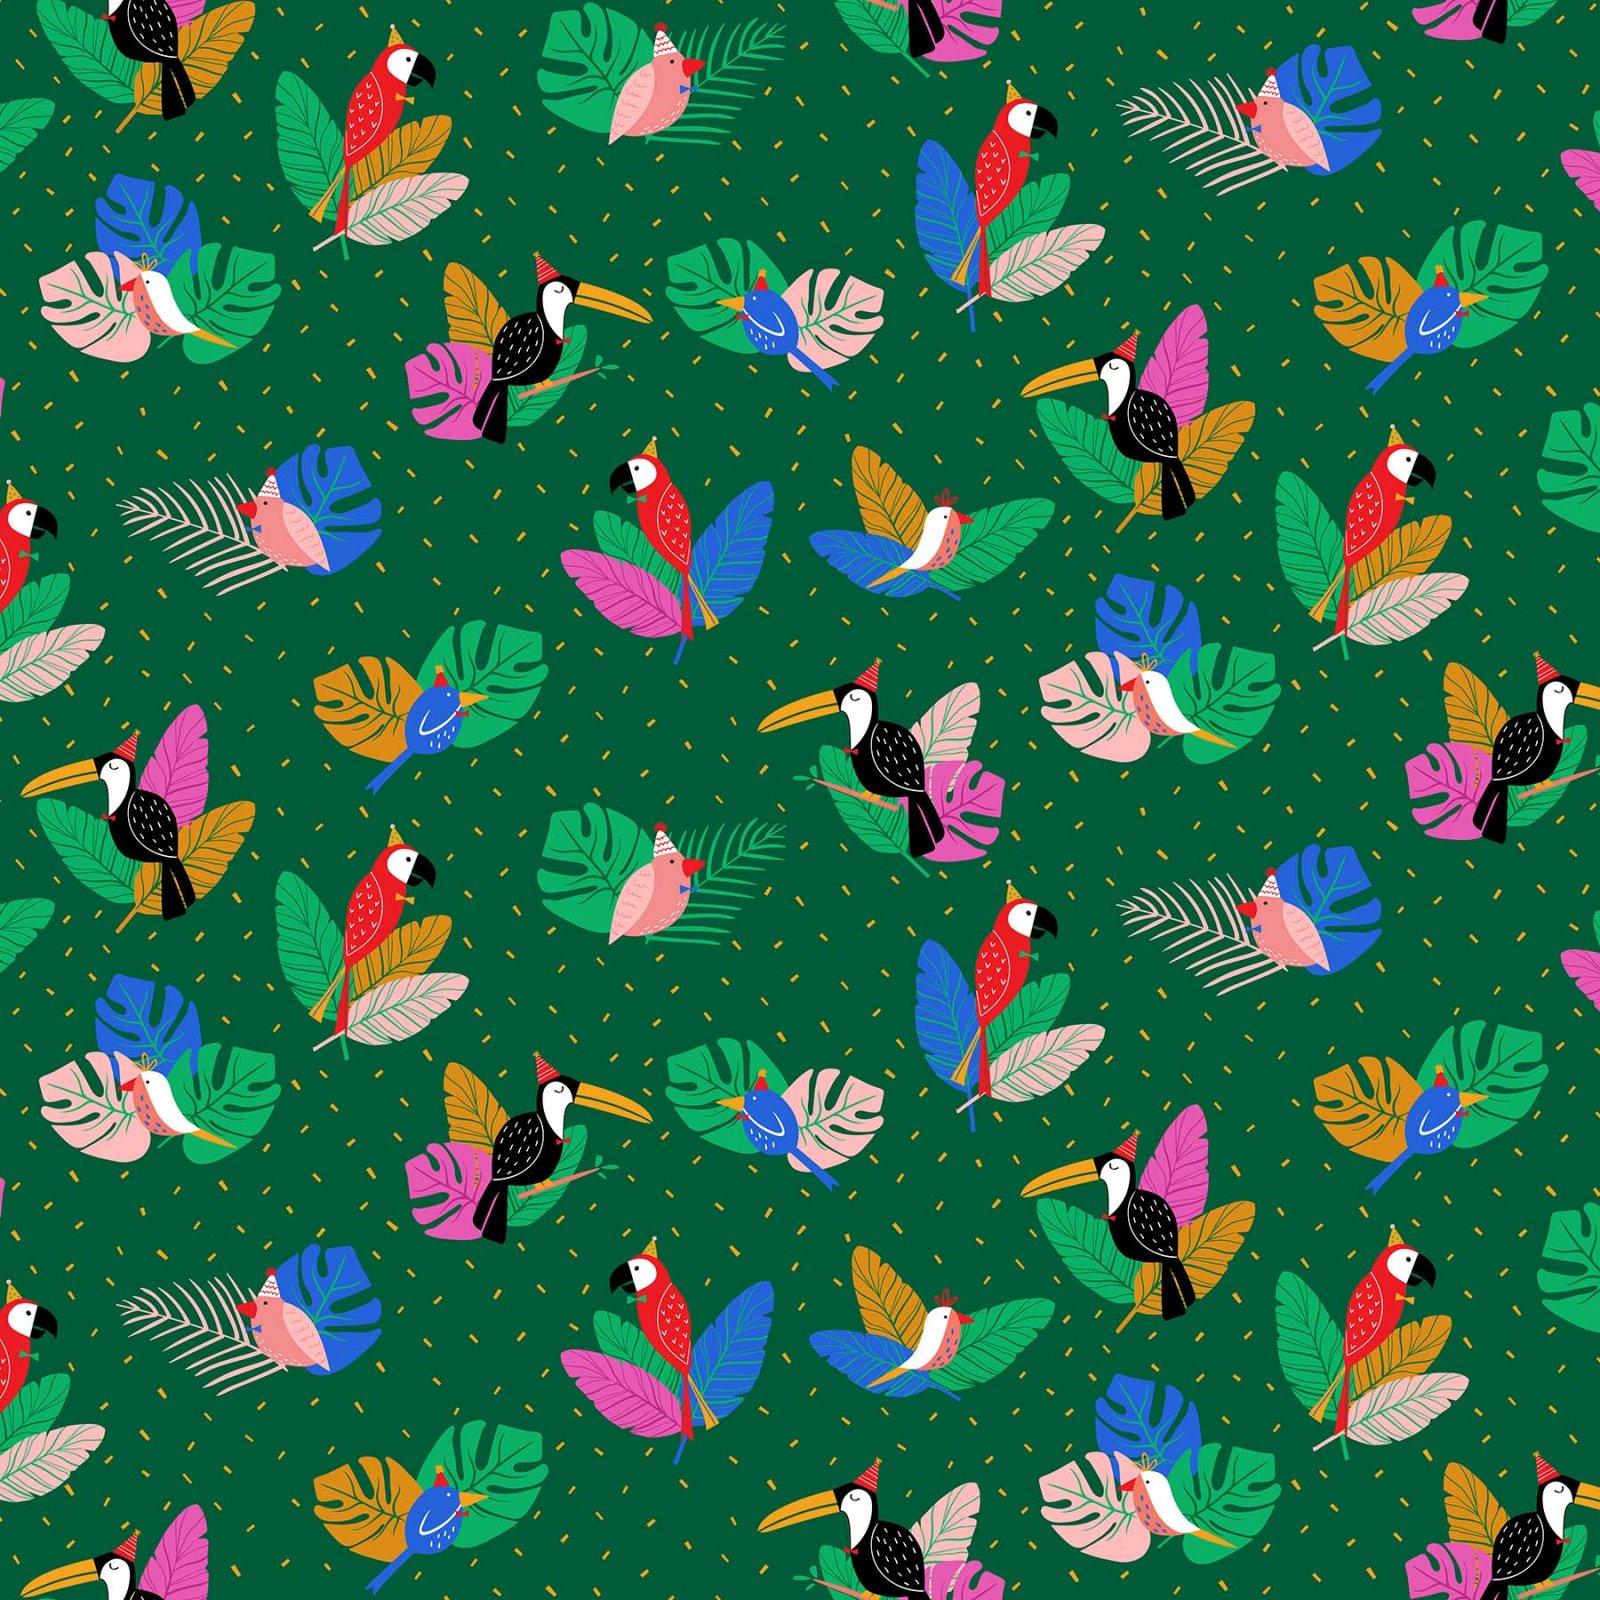 Figo Fabrics - Tropical Jammin' - Parrot Party